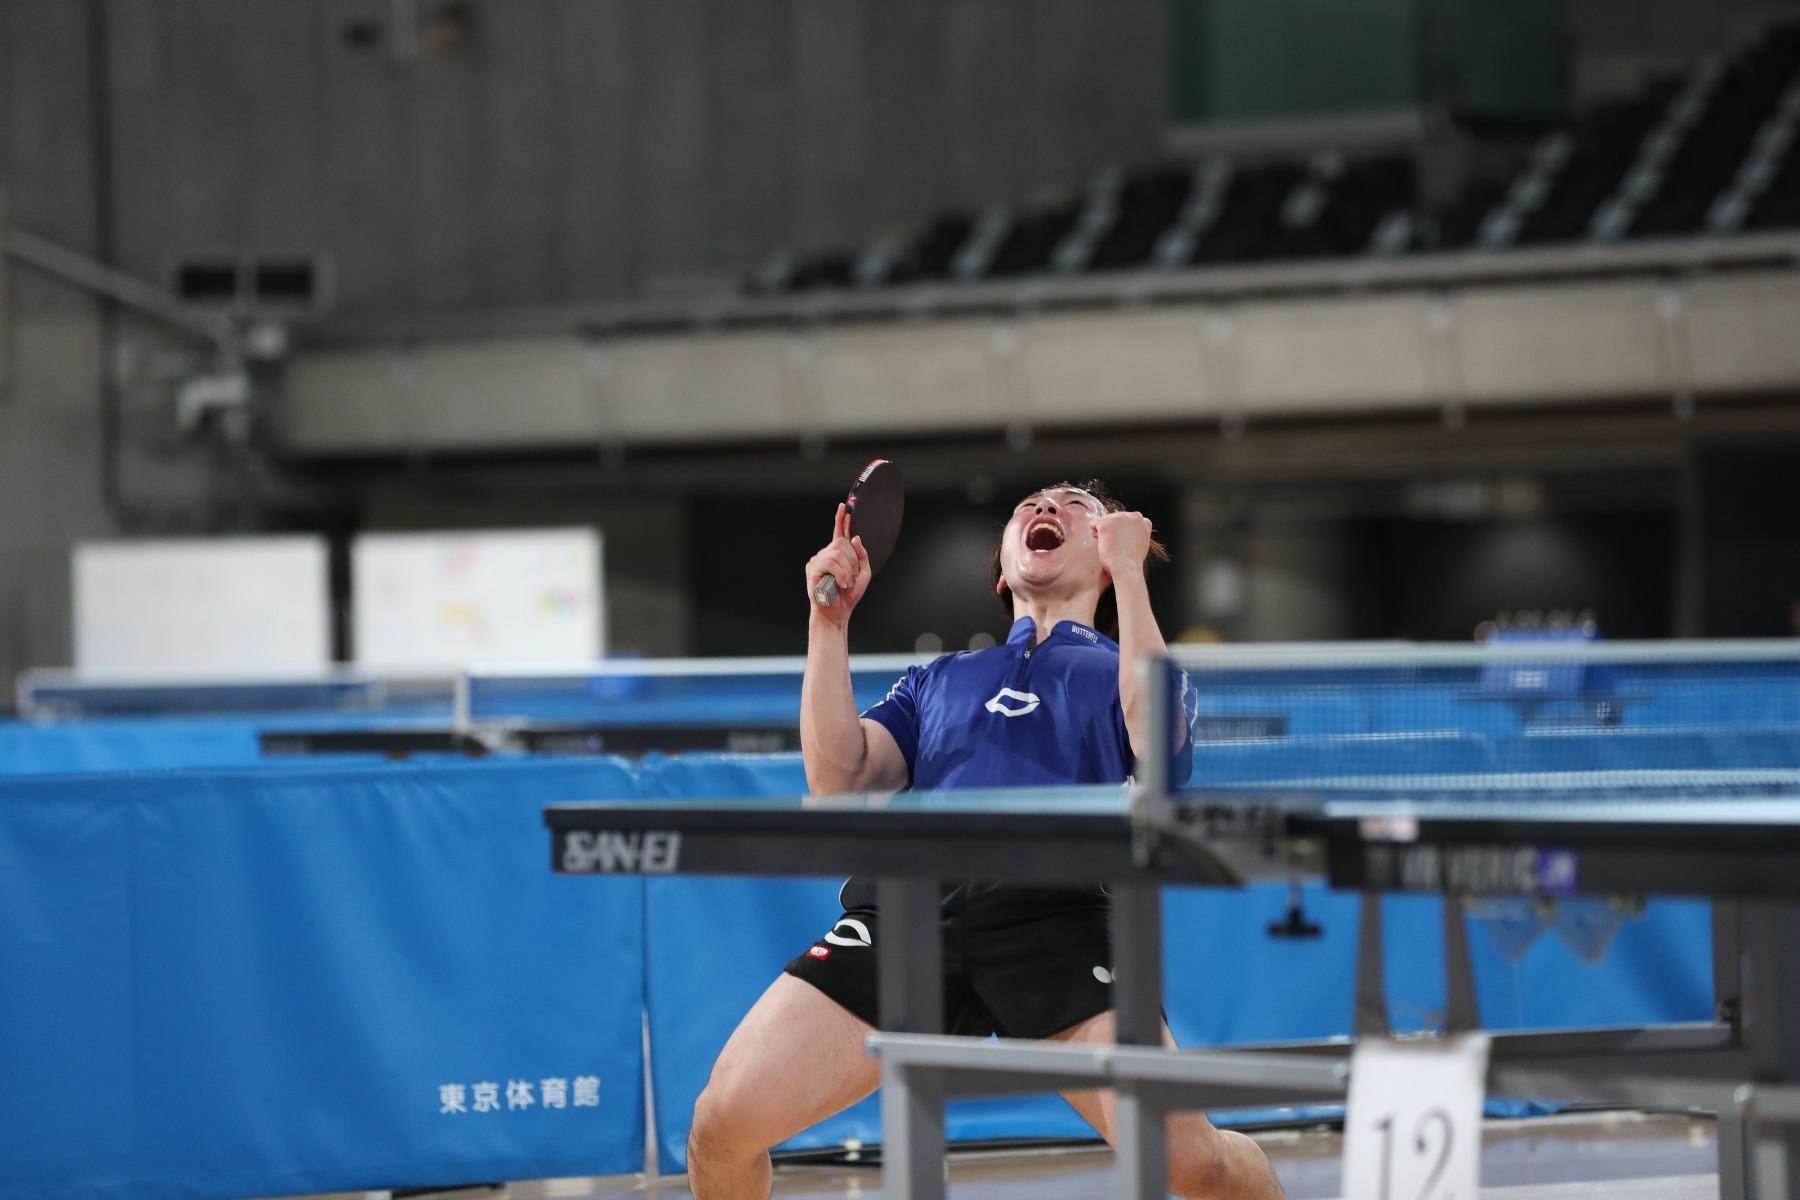 VICTAS VICTAS JOURNAL 卓球 東京優勝大会 男子シングルス 優勝 小野寺翔平